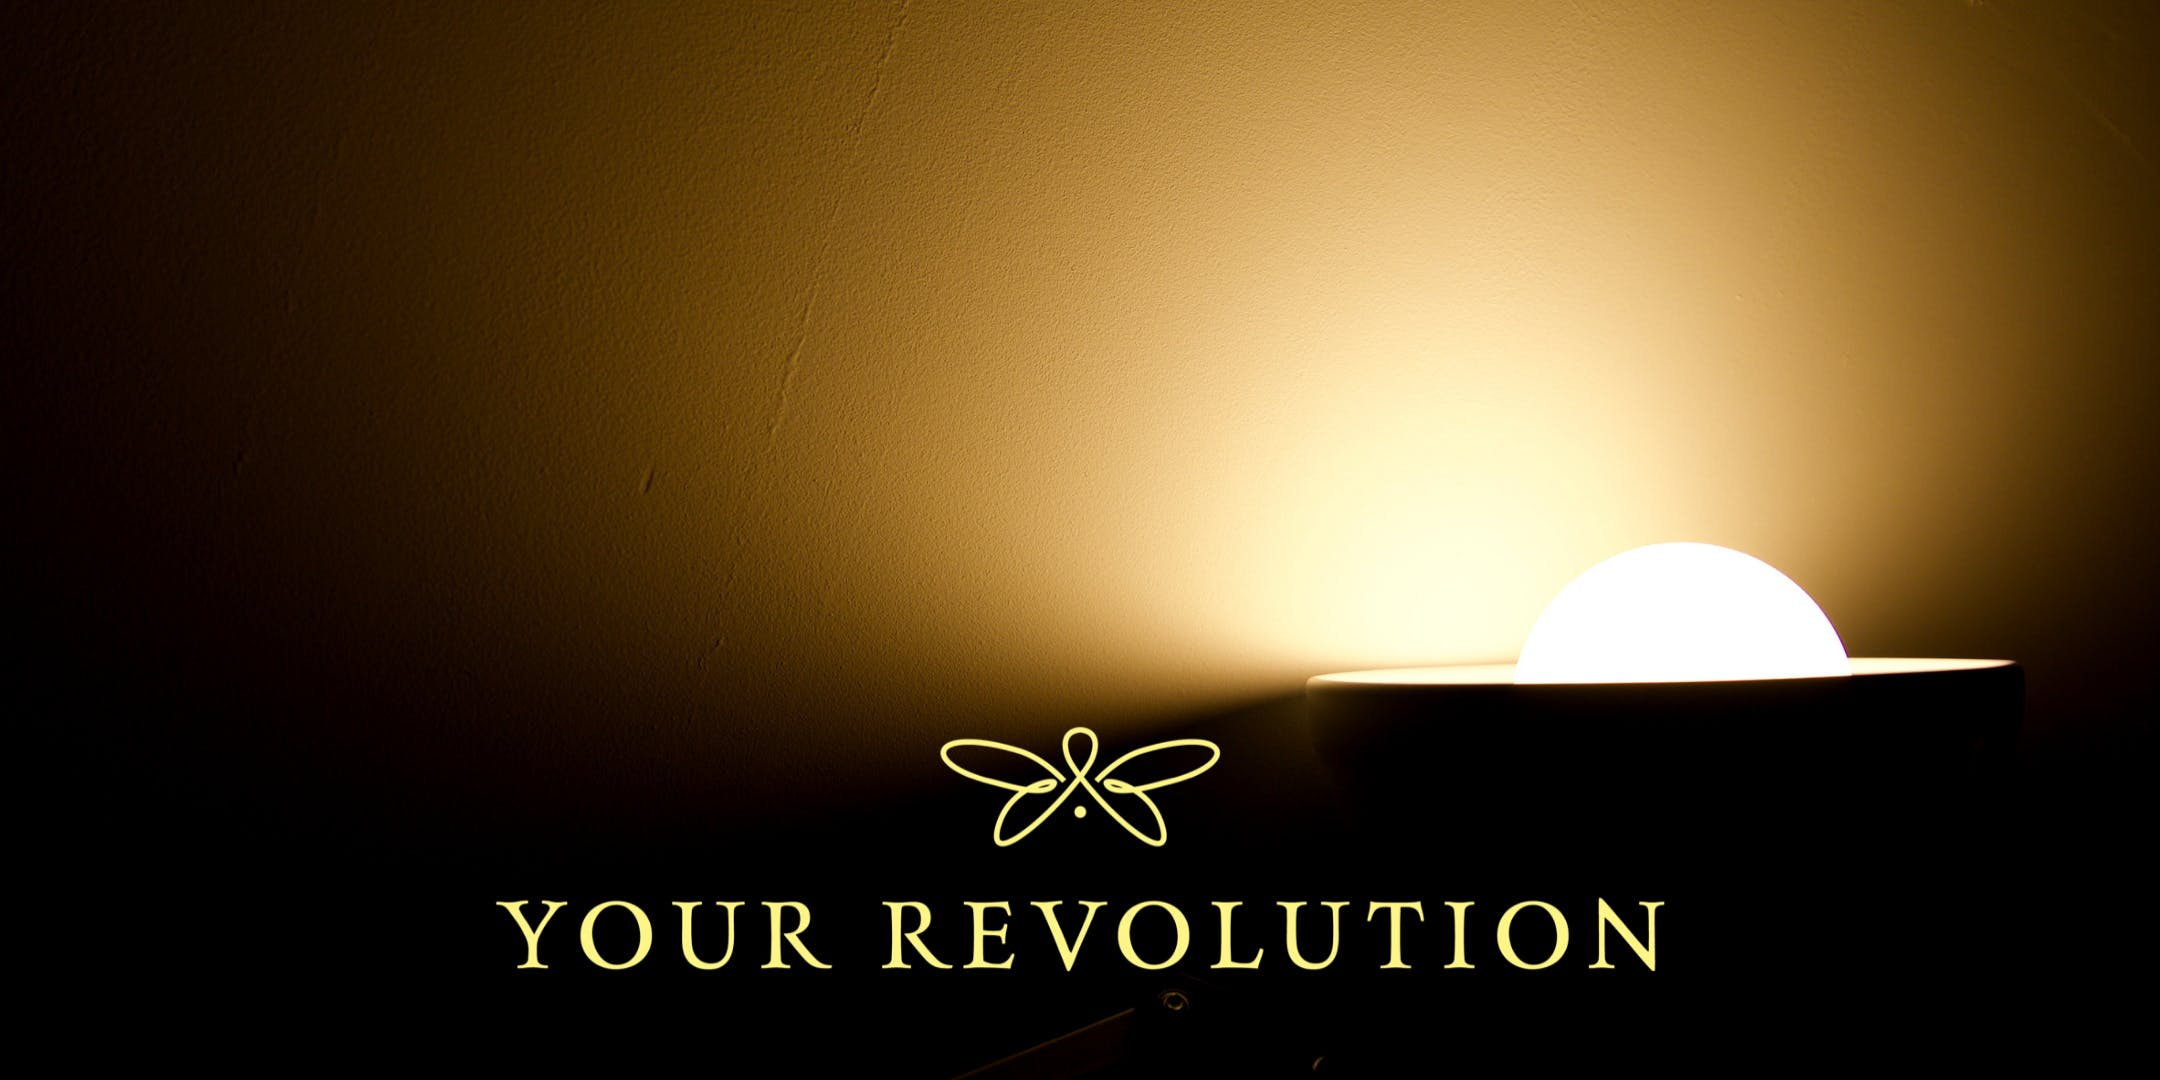 Your Revolution - Ga next level & maak écht impact